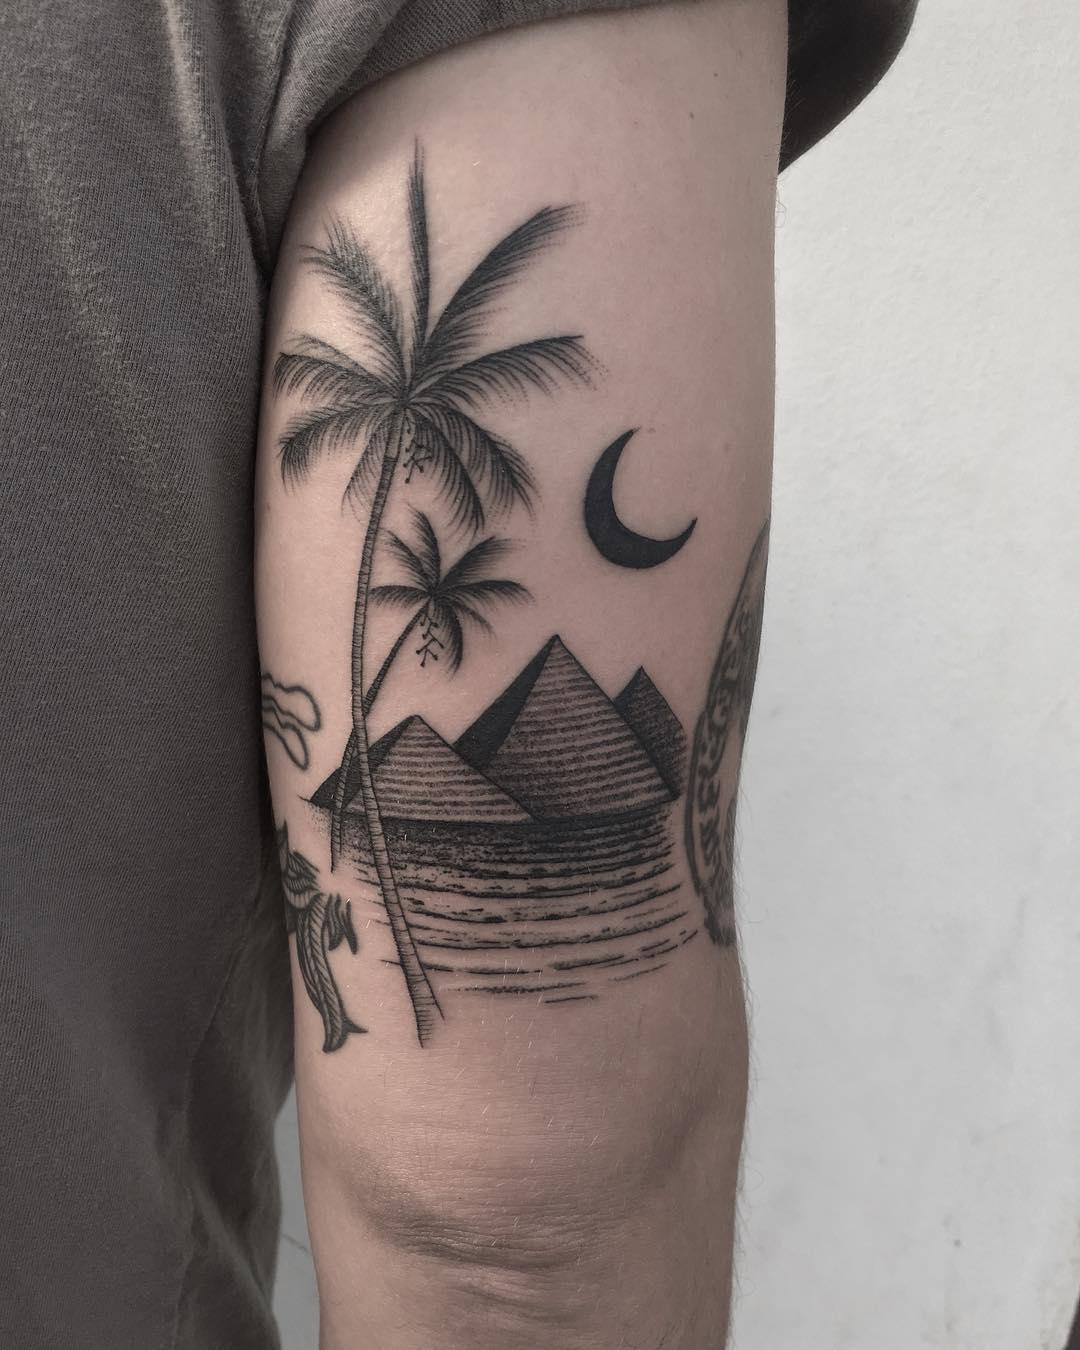 Egyptian night tattoo by @justinoliviertattoo